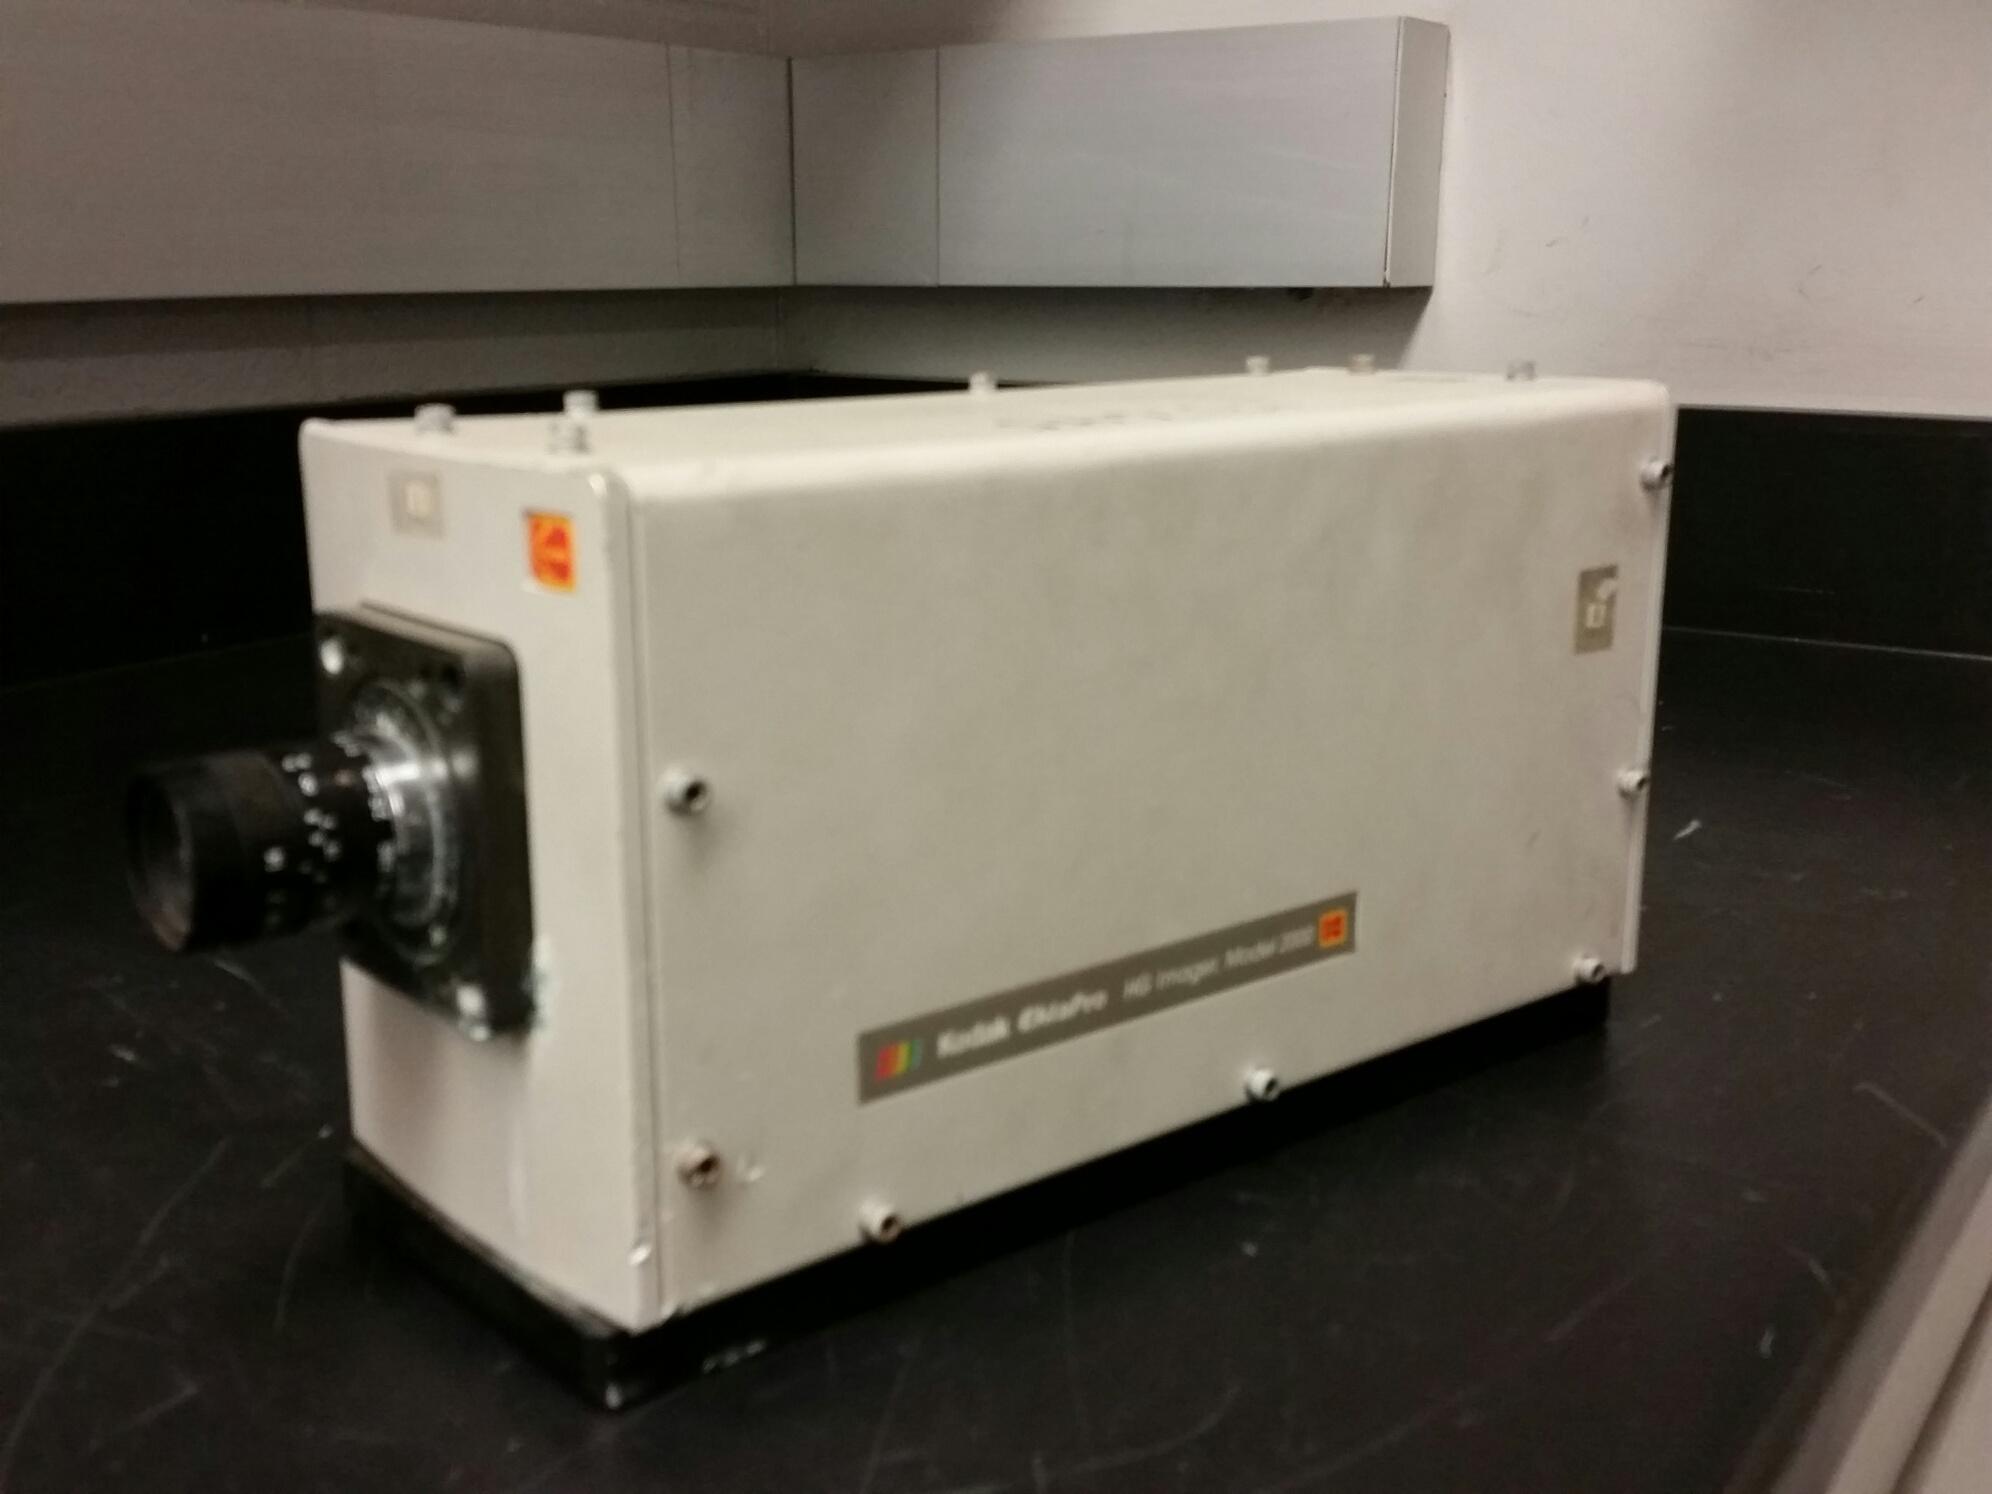 High Speed Video Cameras